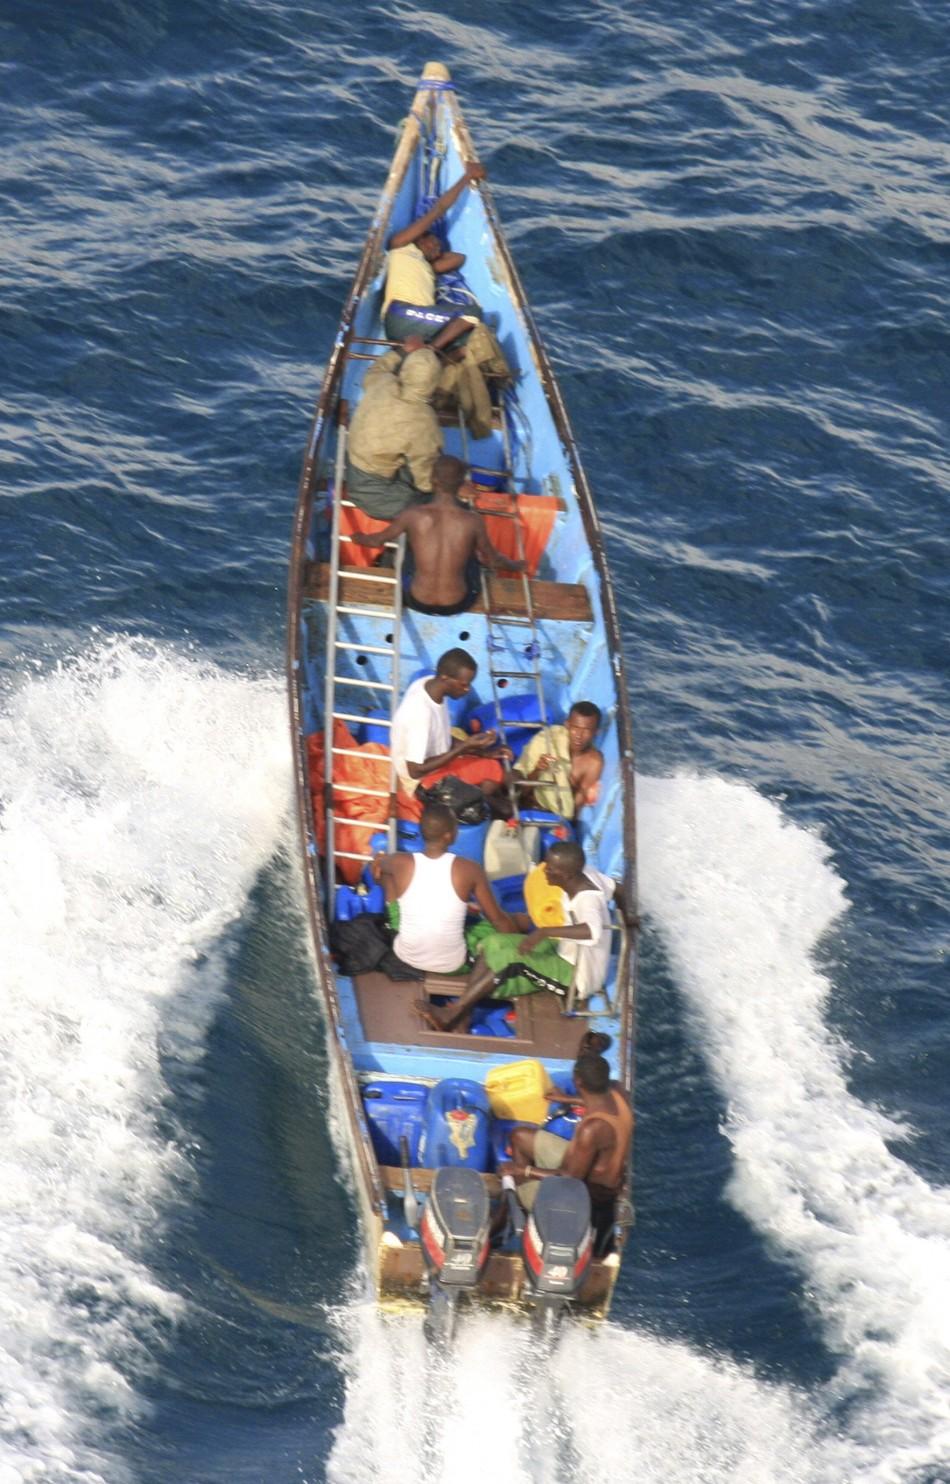 Suspected pirate skiff off coast of Somalia's northern port town of Bossaso